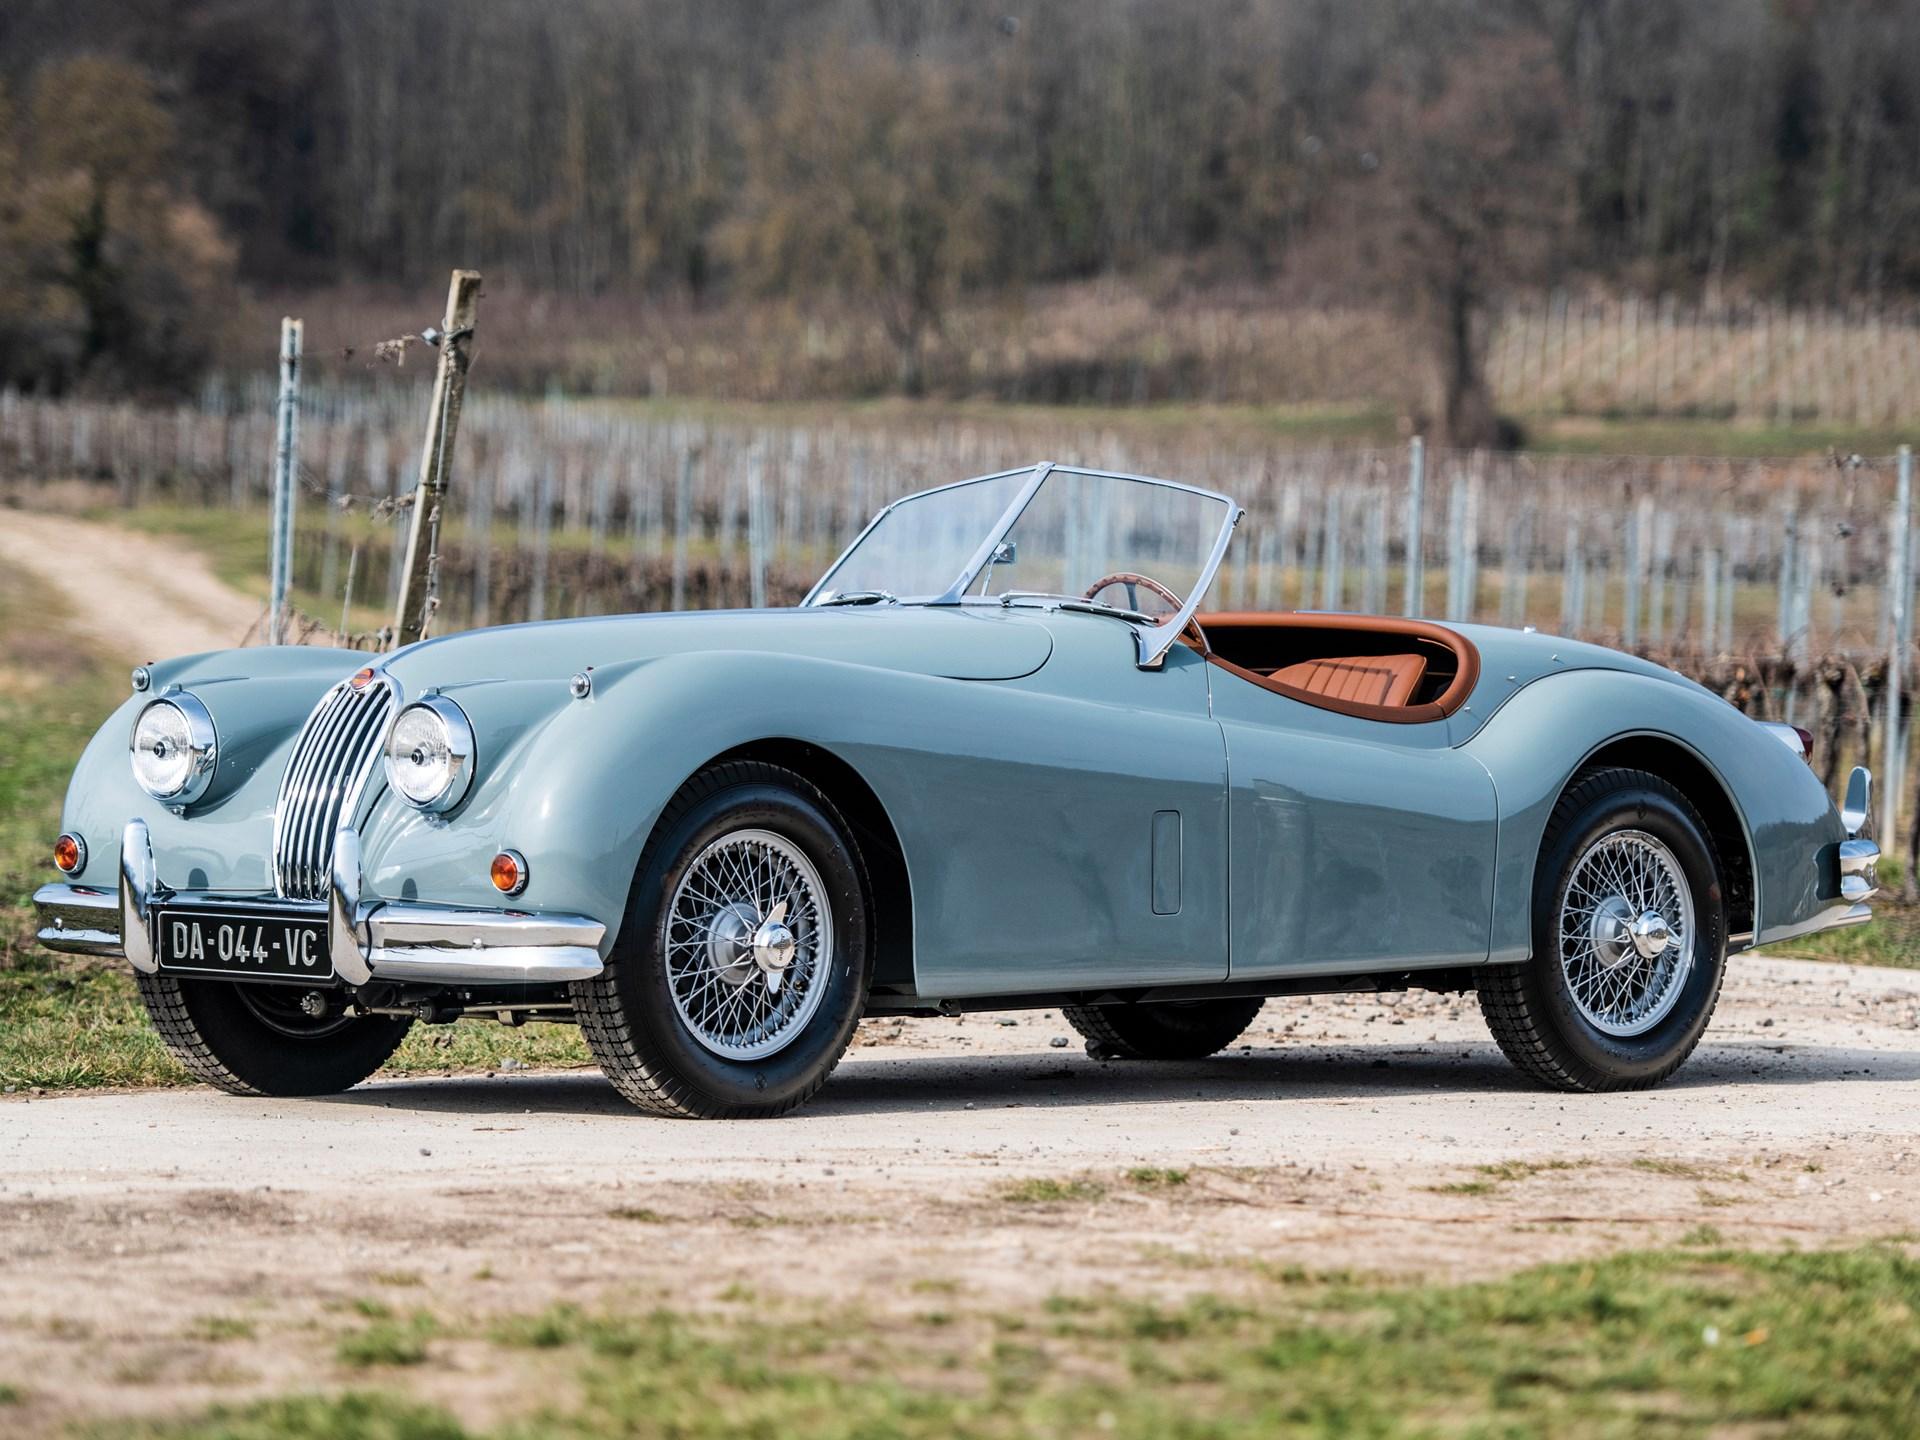 1956 Jaguar XK 140 SE Roadster | Essen 2019 | RM Sotheby's